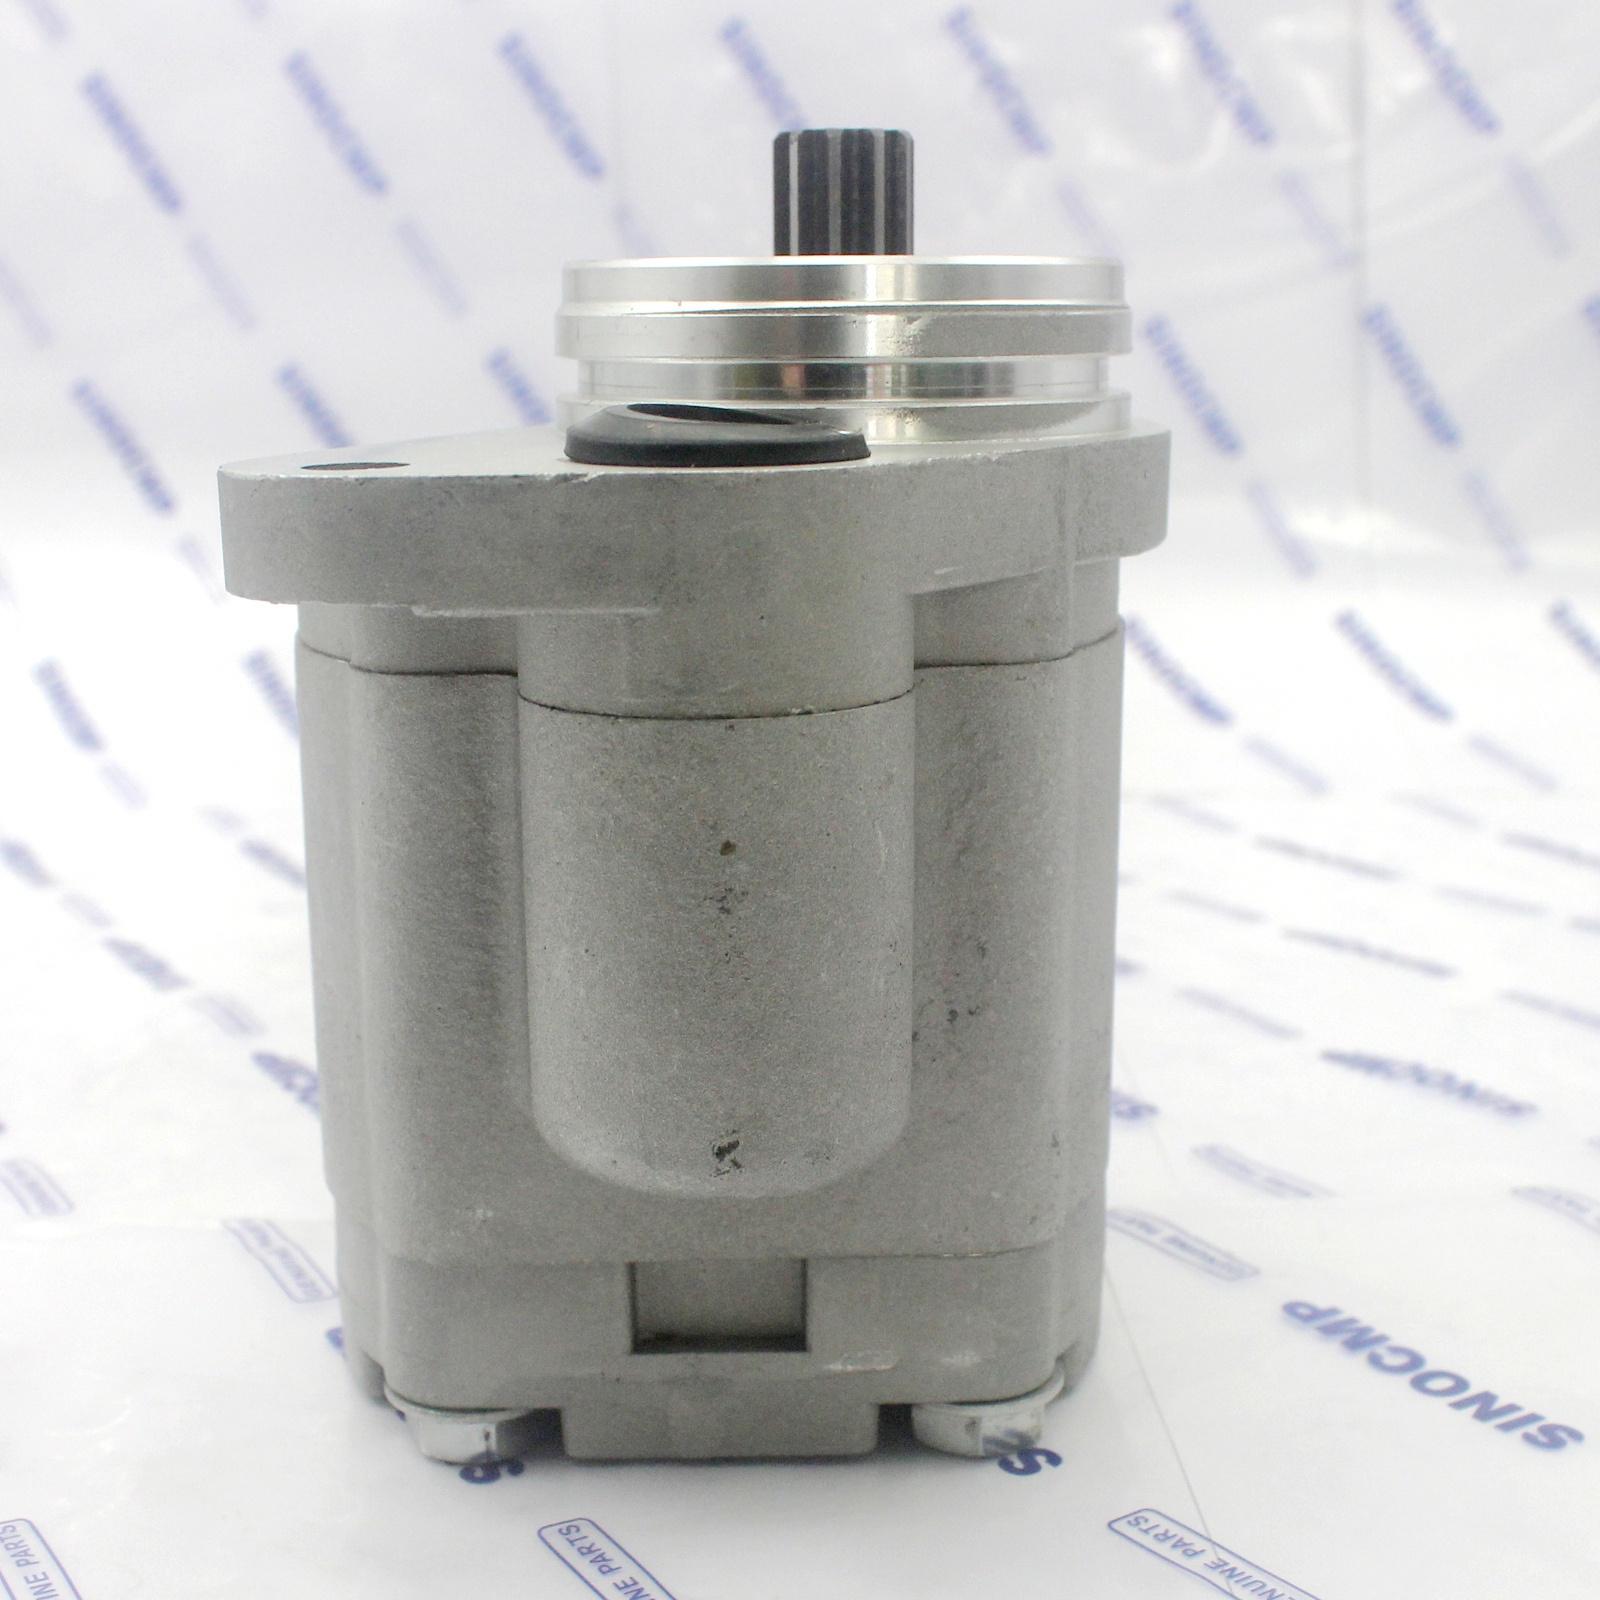 1pc 9218004 4255303 Pilot pump Gear pump For Hitachi EX200-2 EX220-2 Excavator